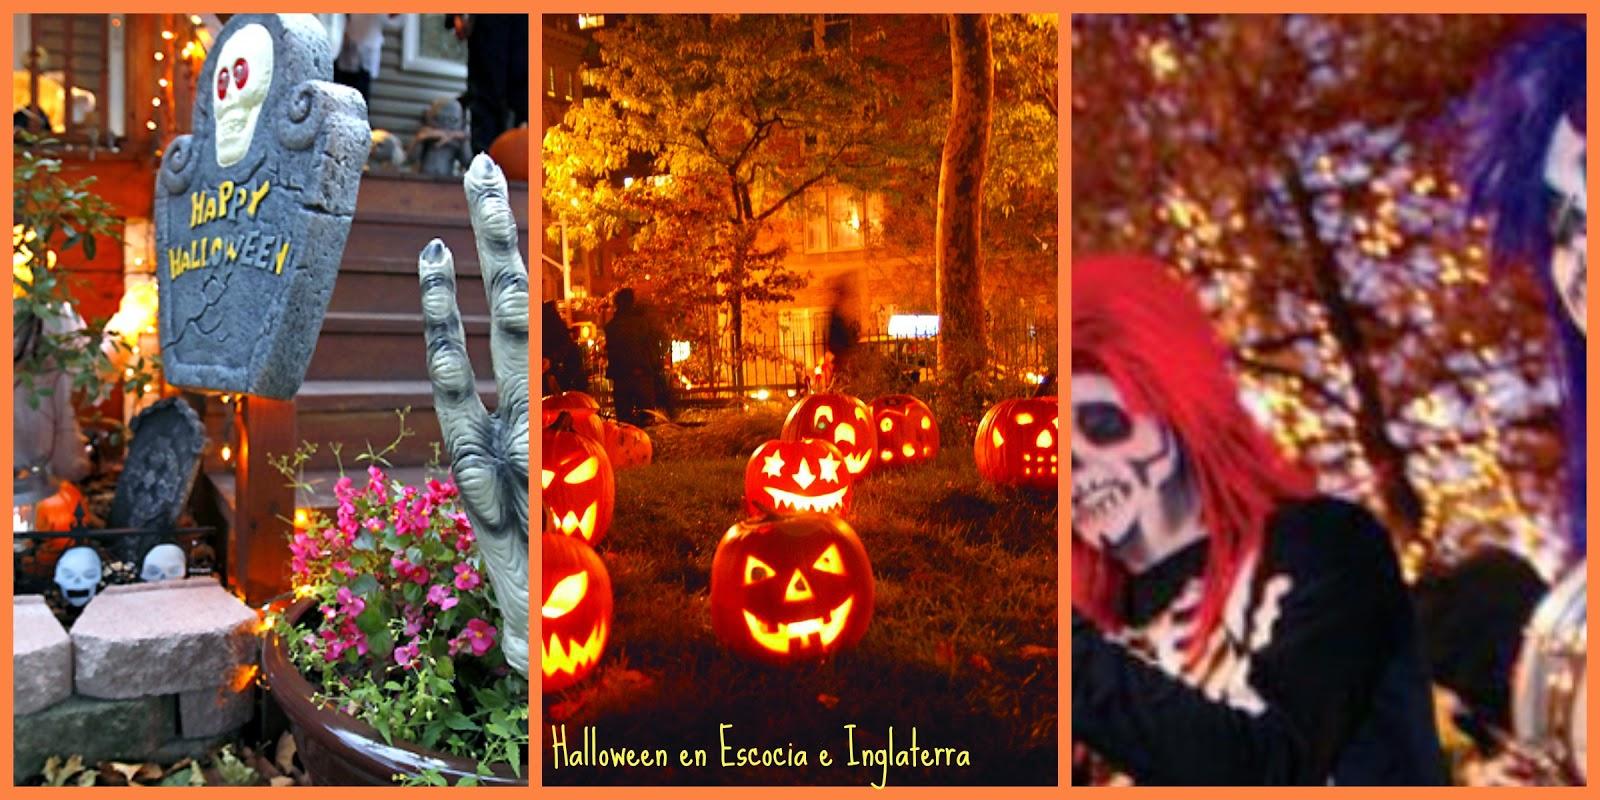 bivestour viajes: la fiesta de halloween, diferentes costumbres